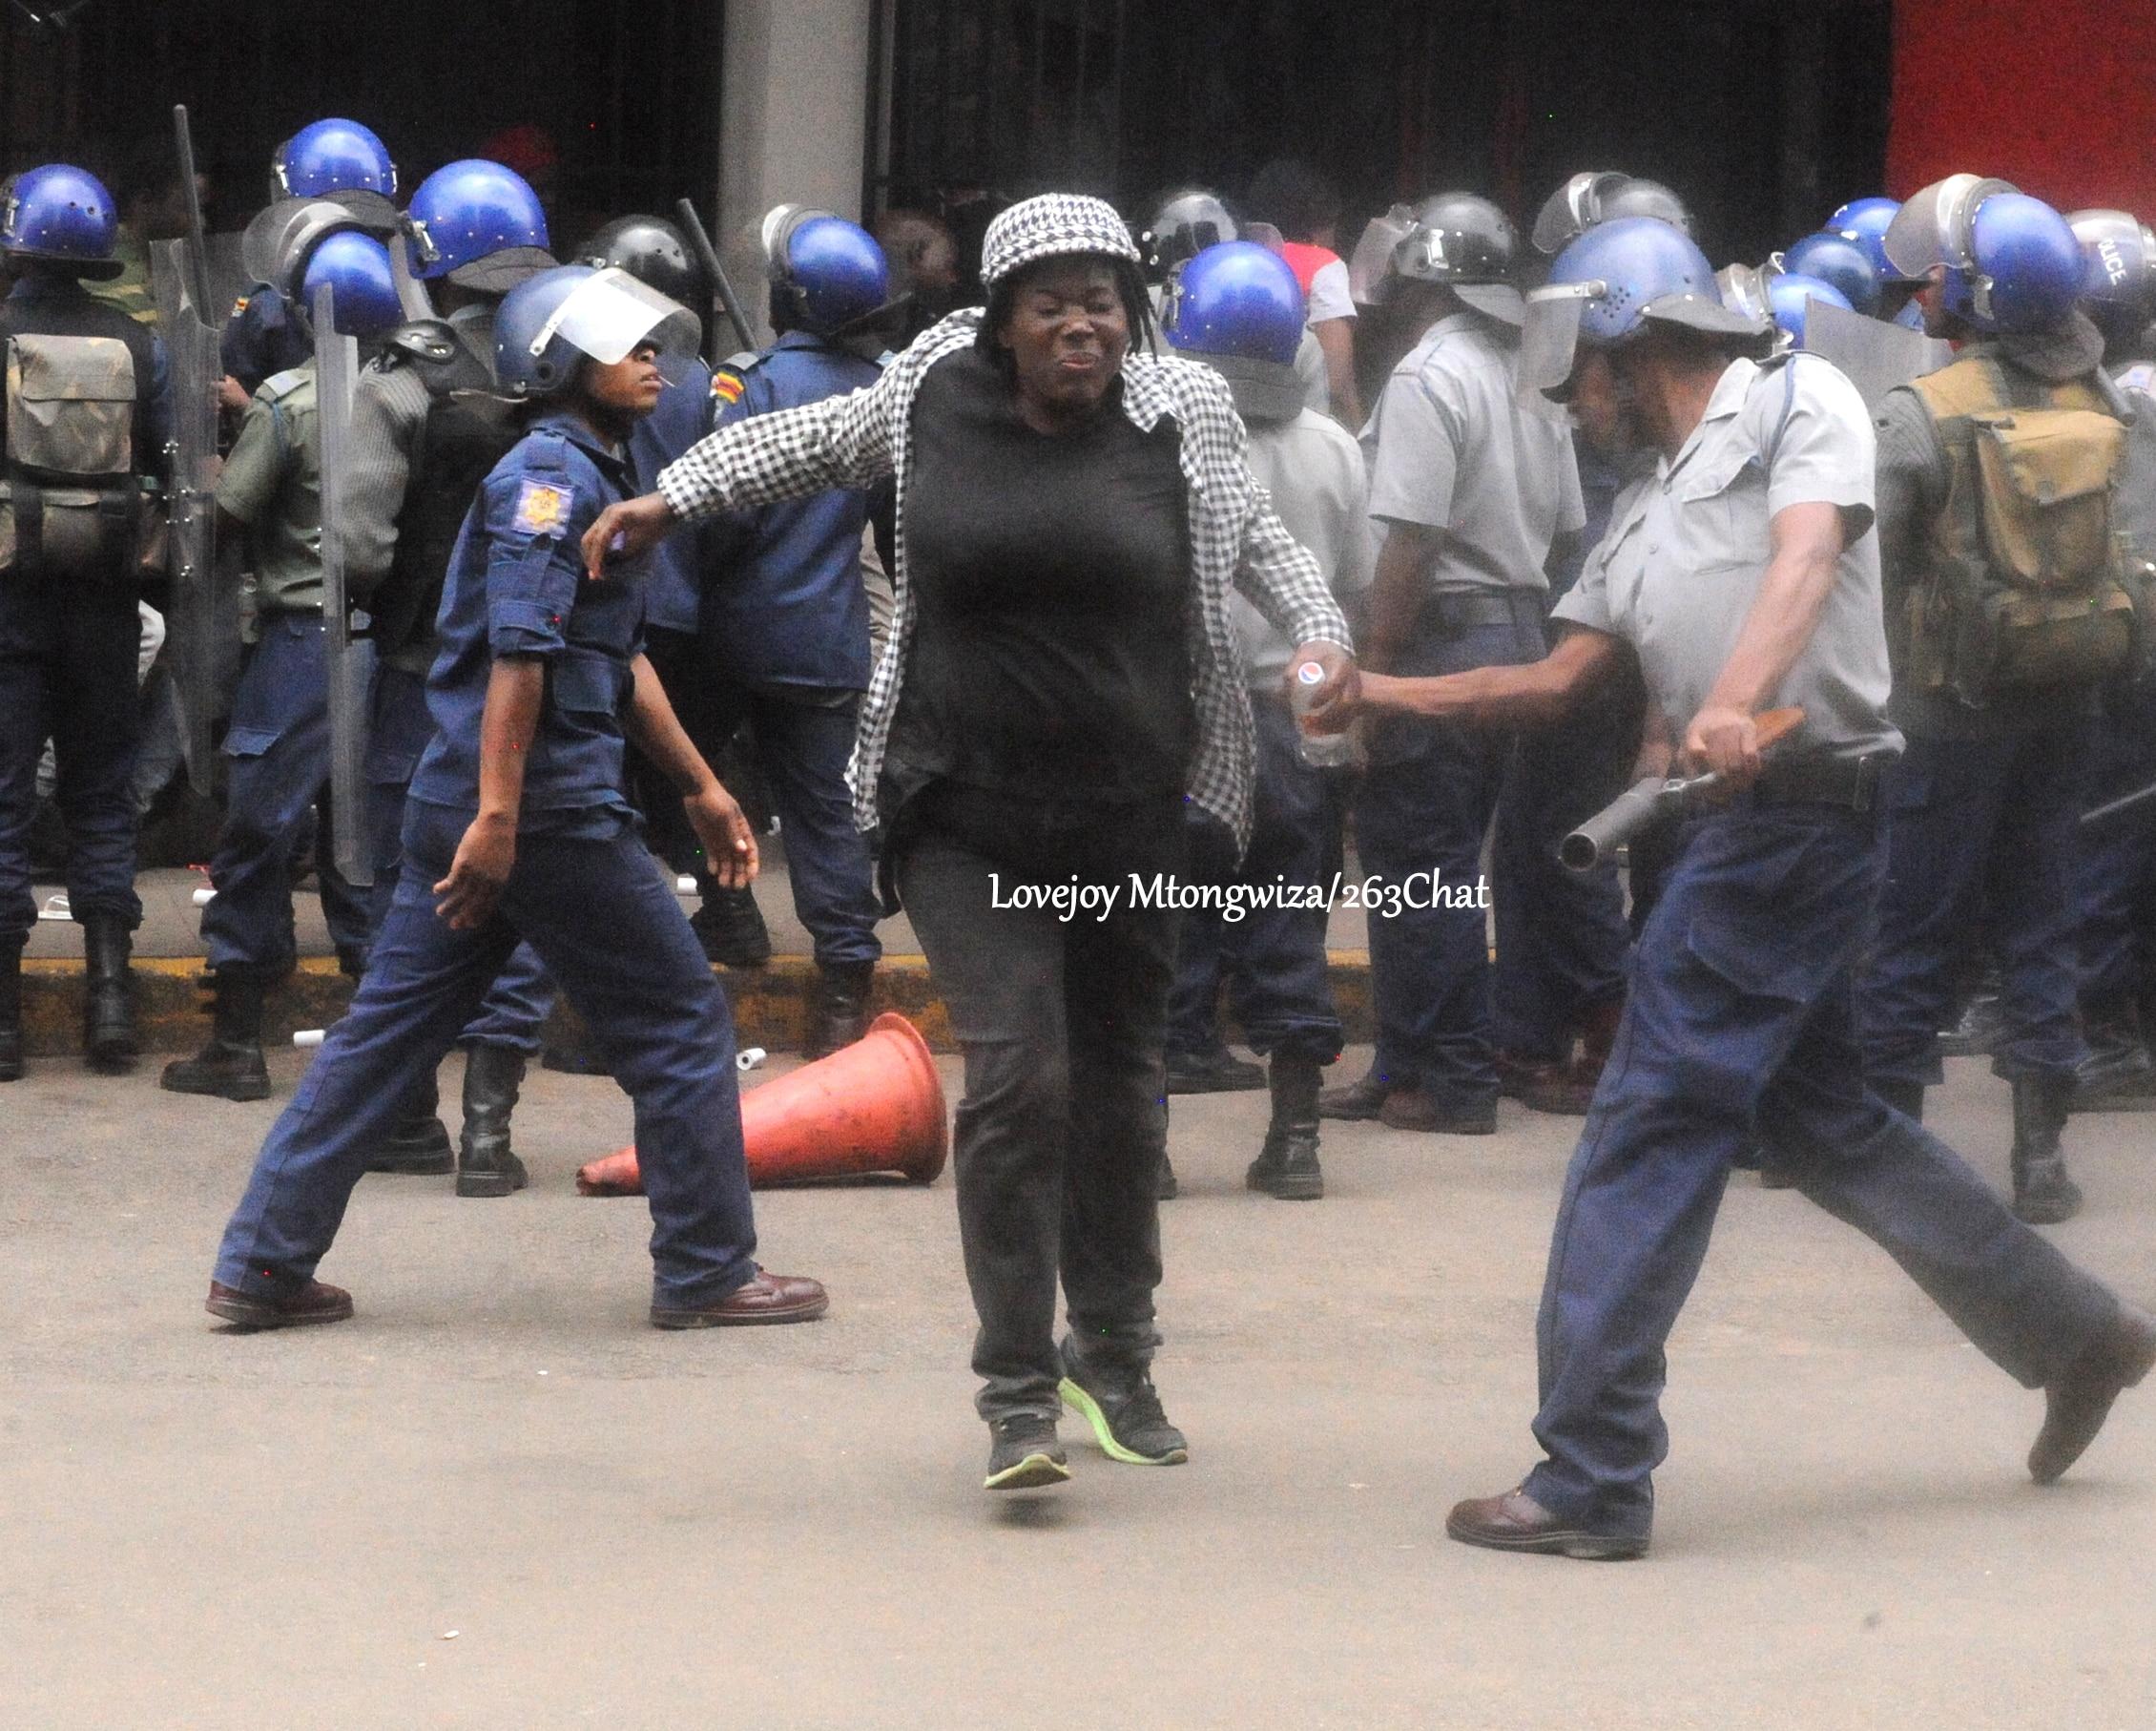 'ED Should Not Tolerate Demo Nonsense'- ZanuPF | 263Chat